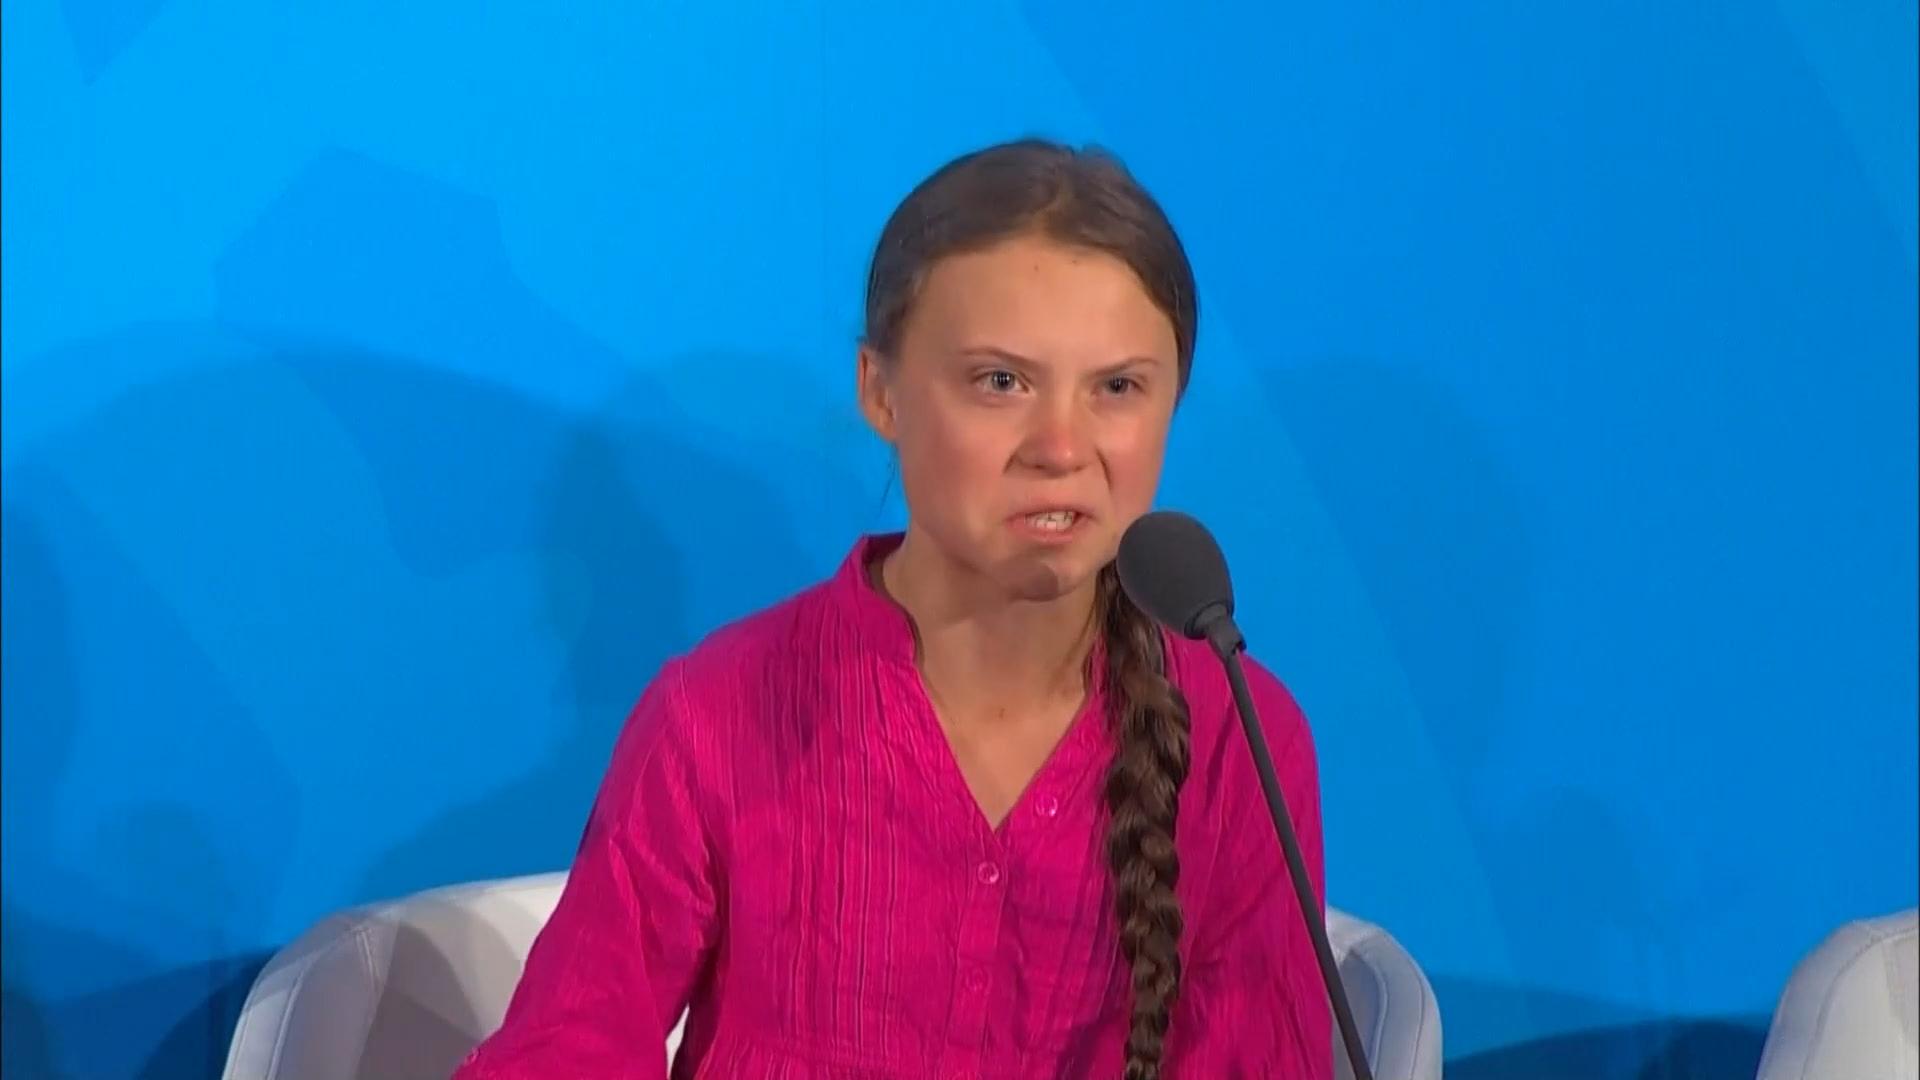 Greta Thunberg Evil-Eyeing Trump At UN Summit Is The Internet's Hottest New GIF